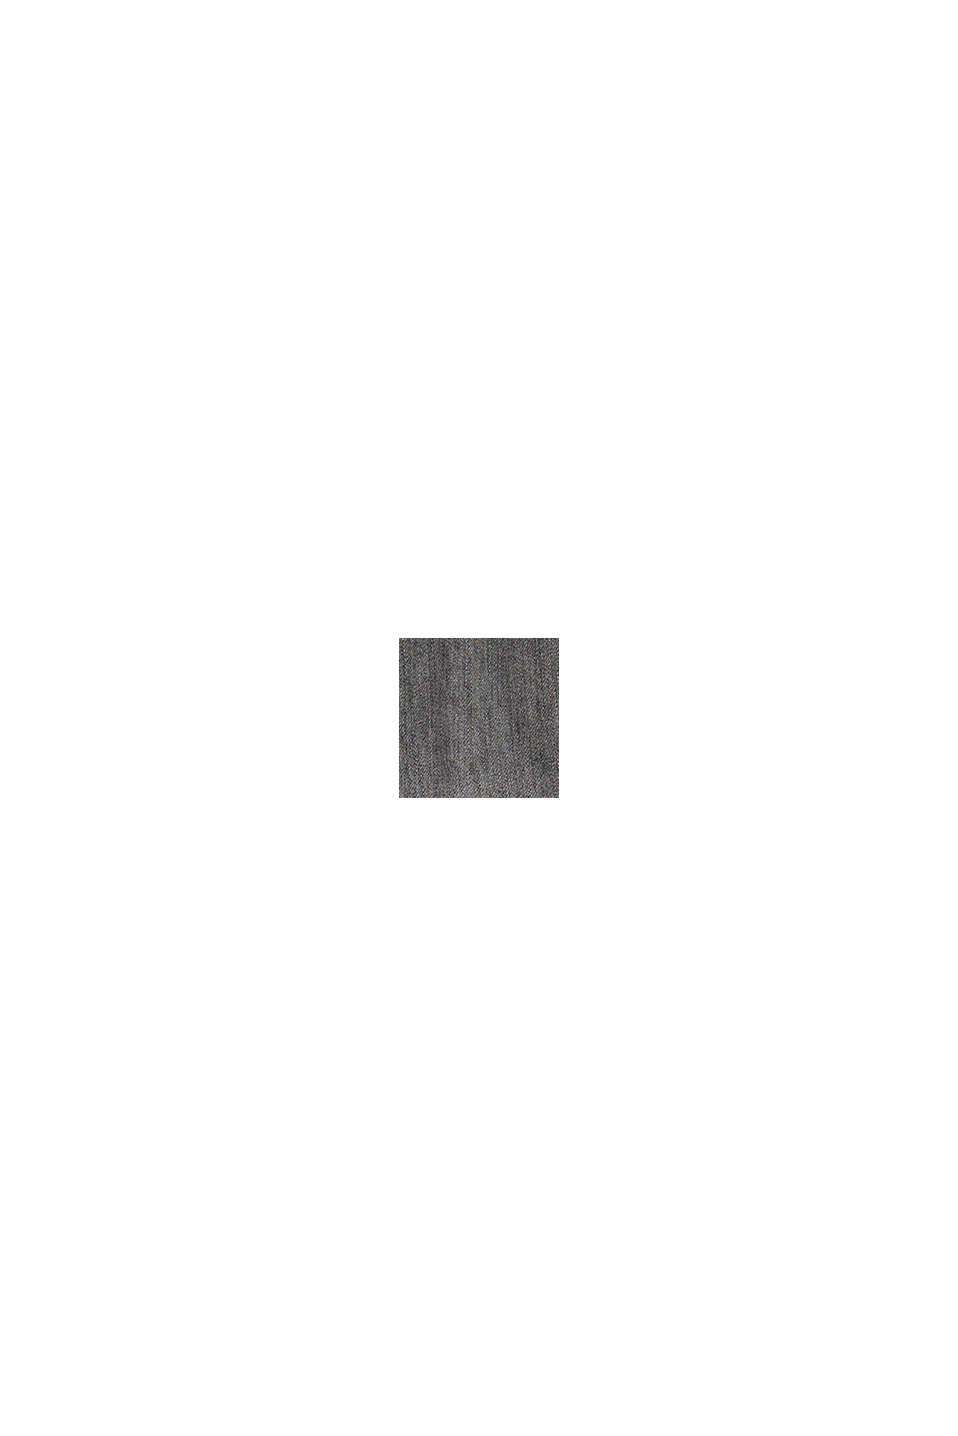 Jean à taille côtelée, 100% coton bio, GREY MEDIUM WASHED, swatch